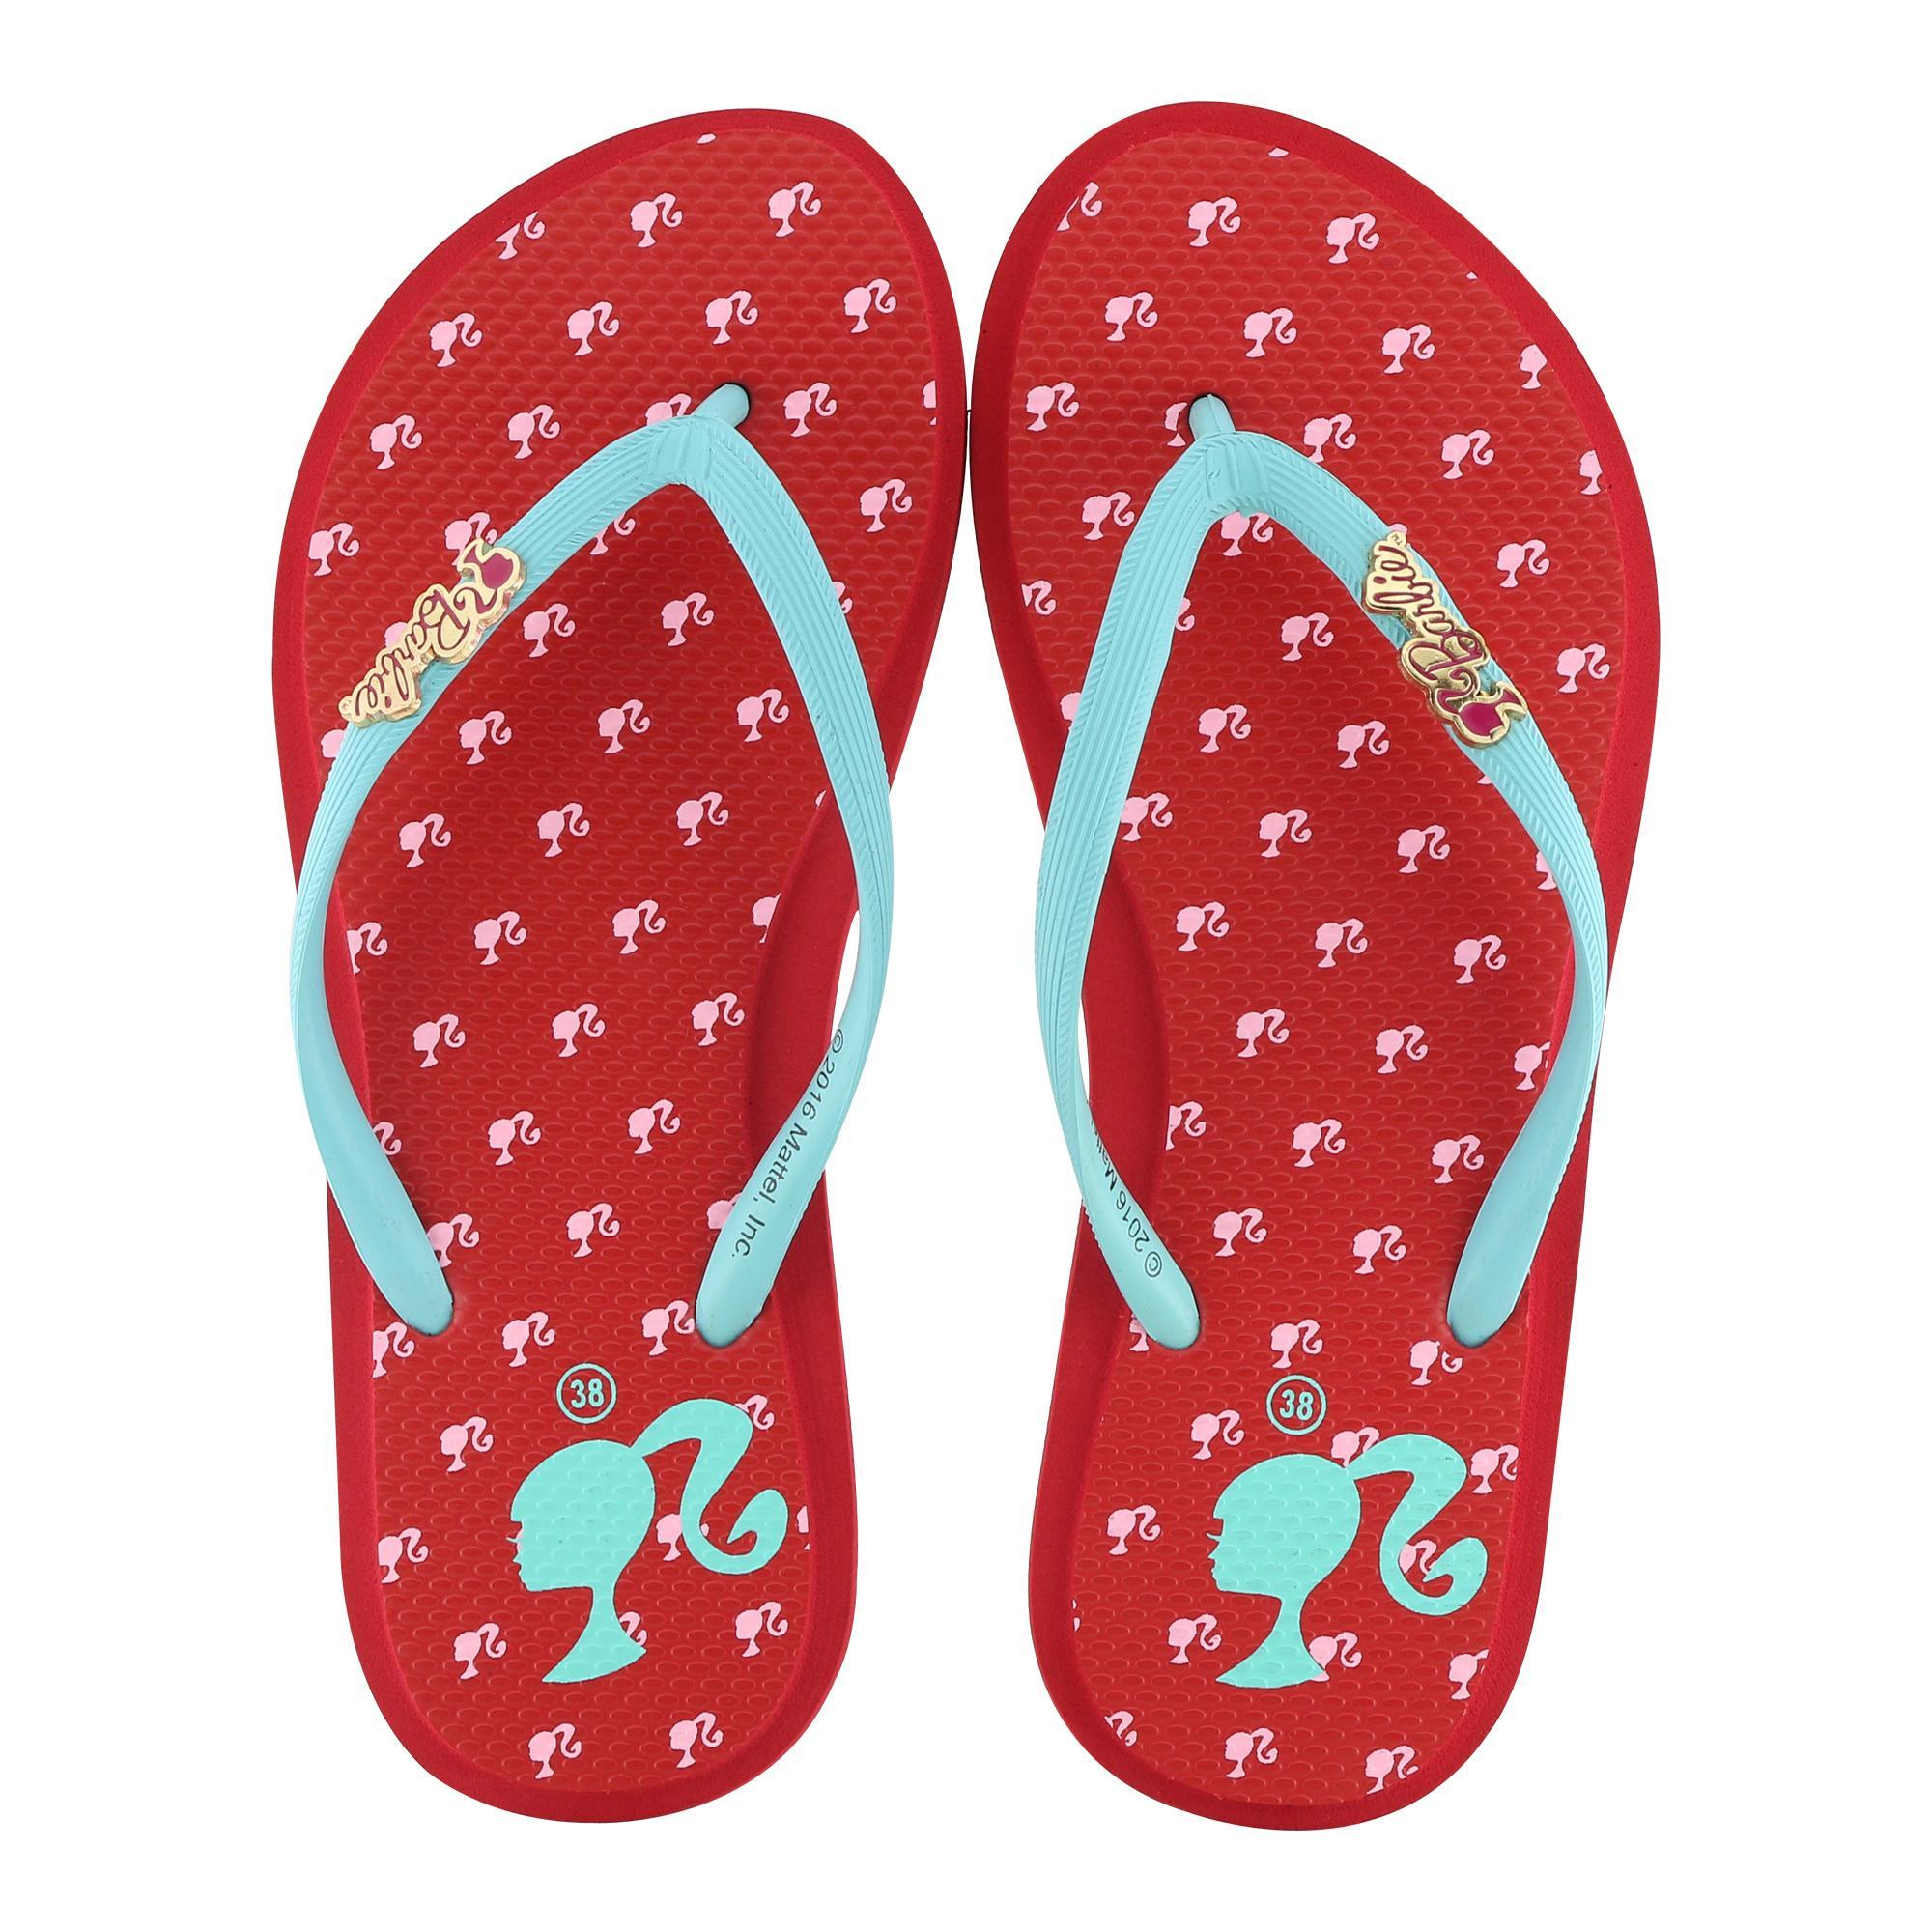 Ando Sandal Flip Flop Wanita Limited Edition Barbie022 [Merah]